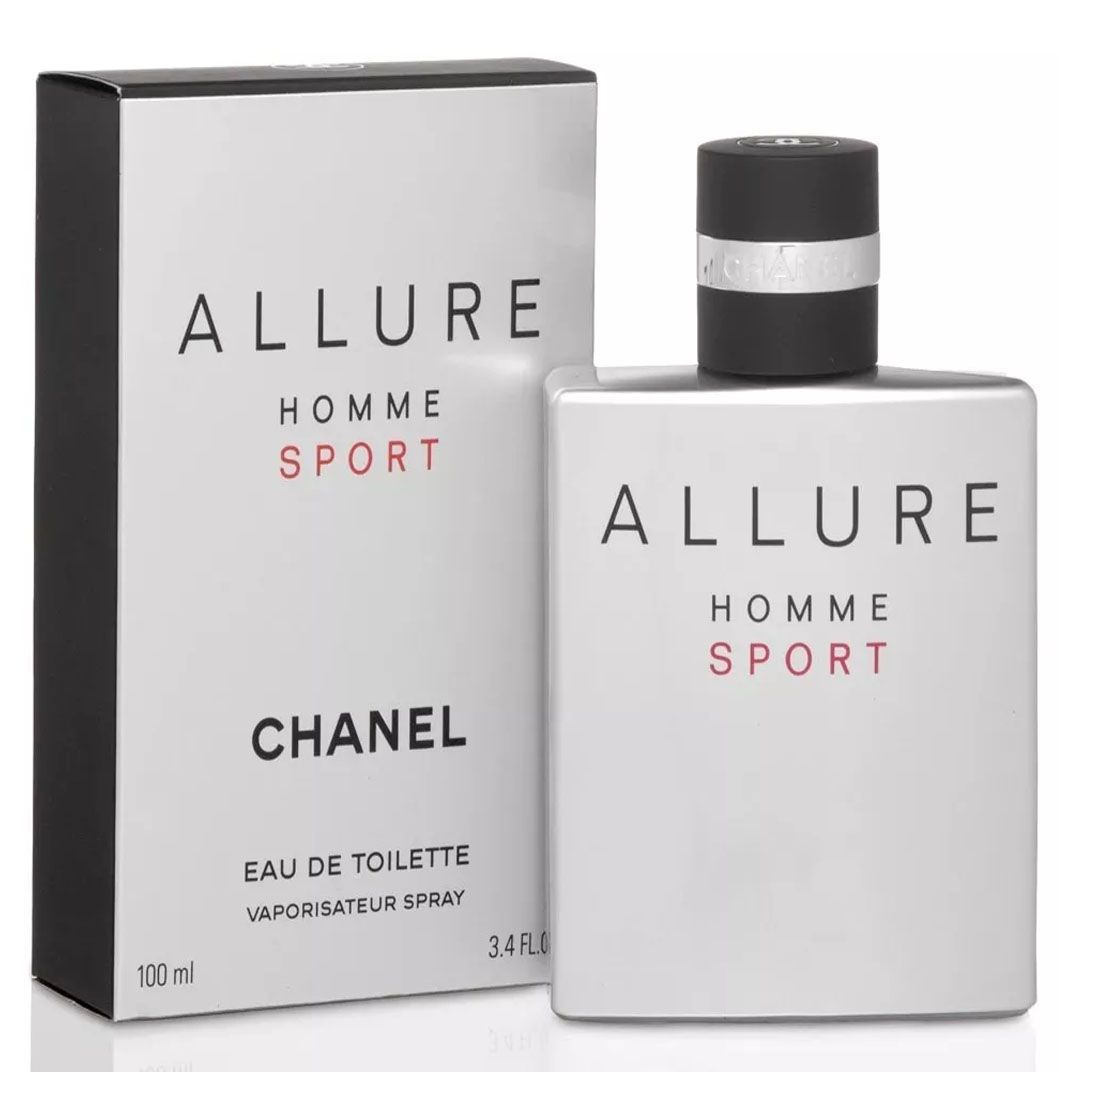 Perfume Allure Homme Sport Chanel 100ml